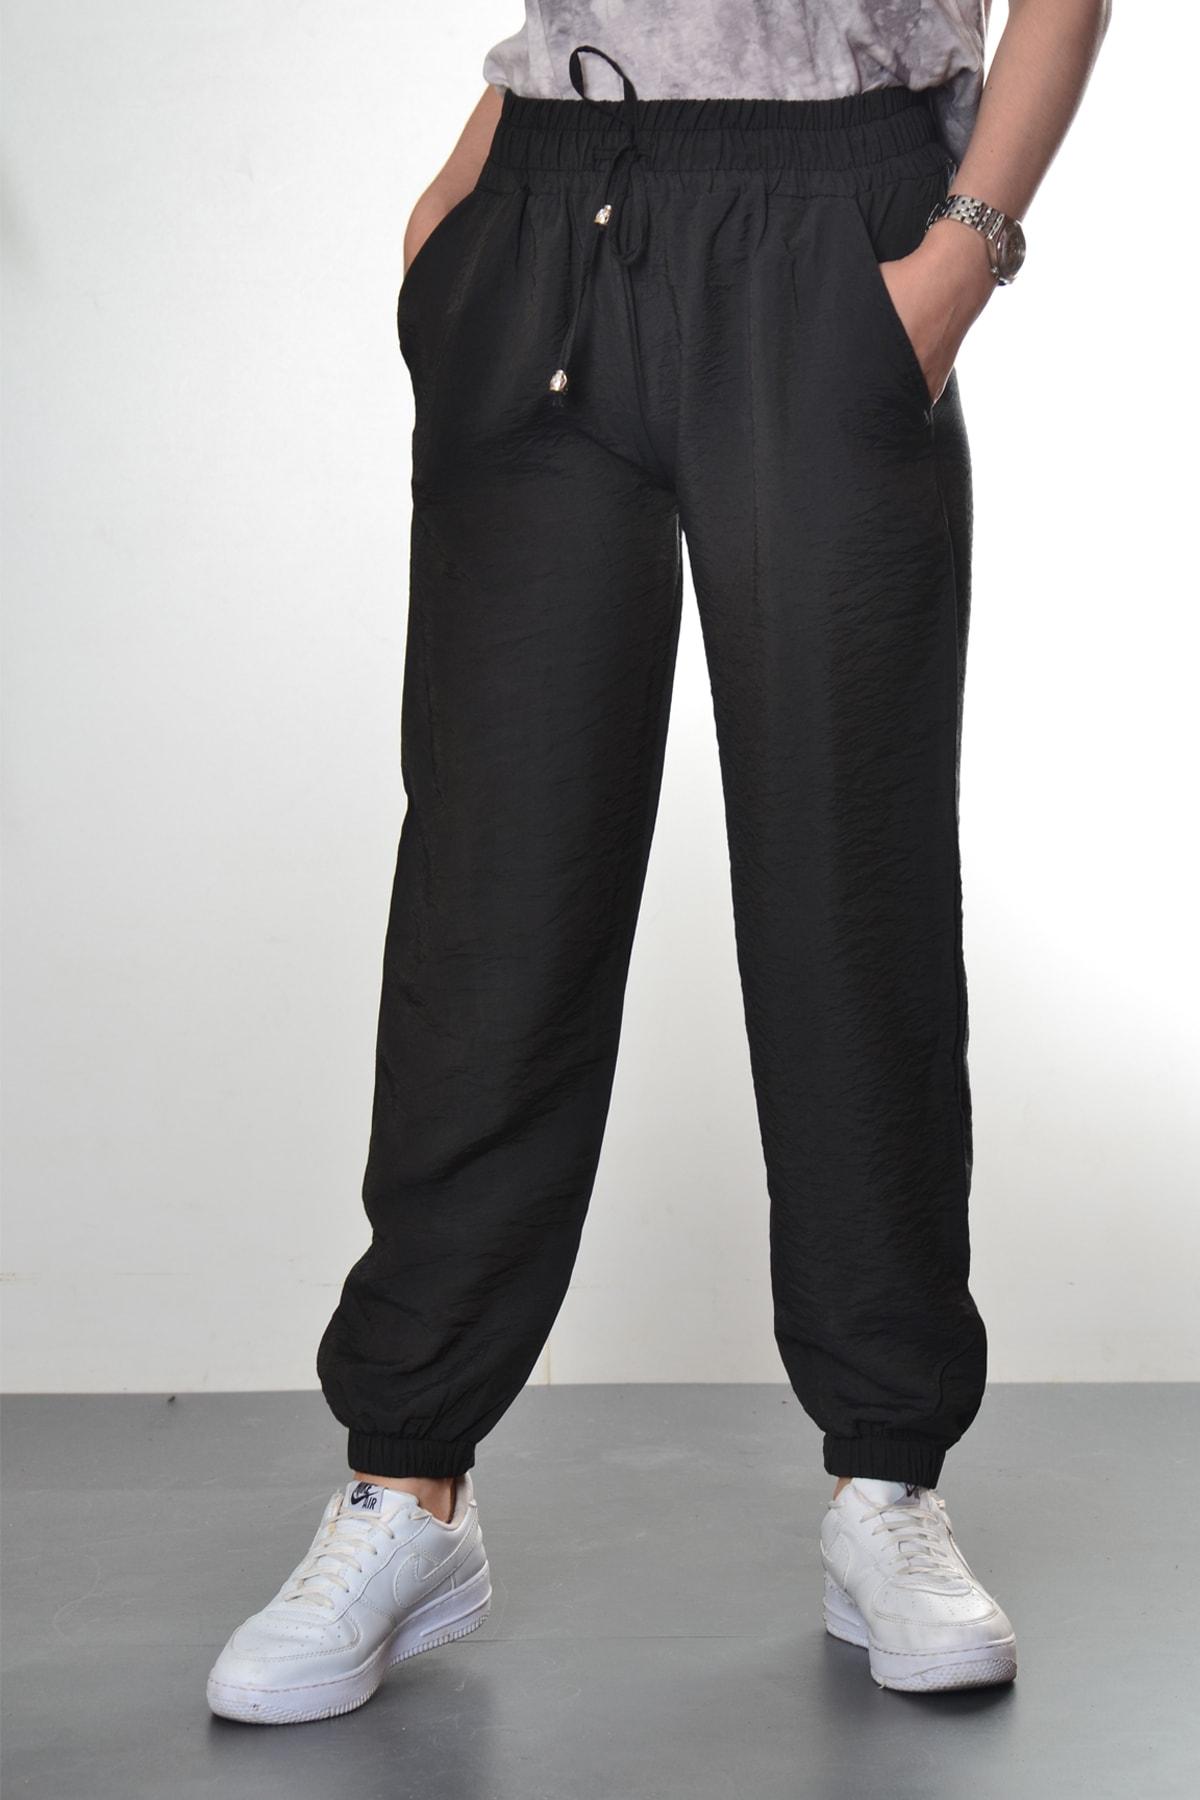 Modayns Kadın Siyah Manşet Ve Cep Detaylı Pantolon 1